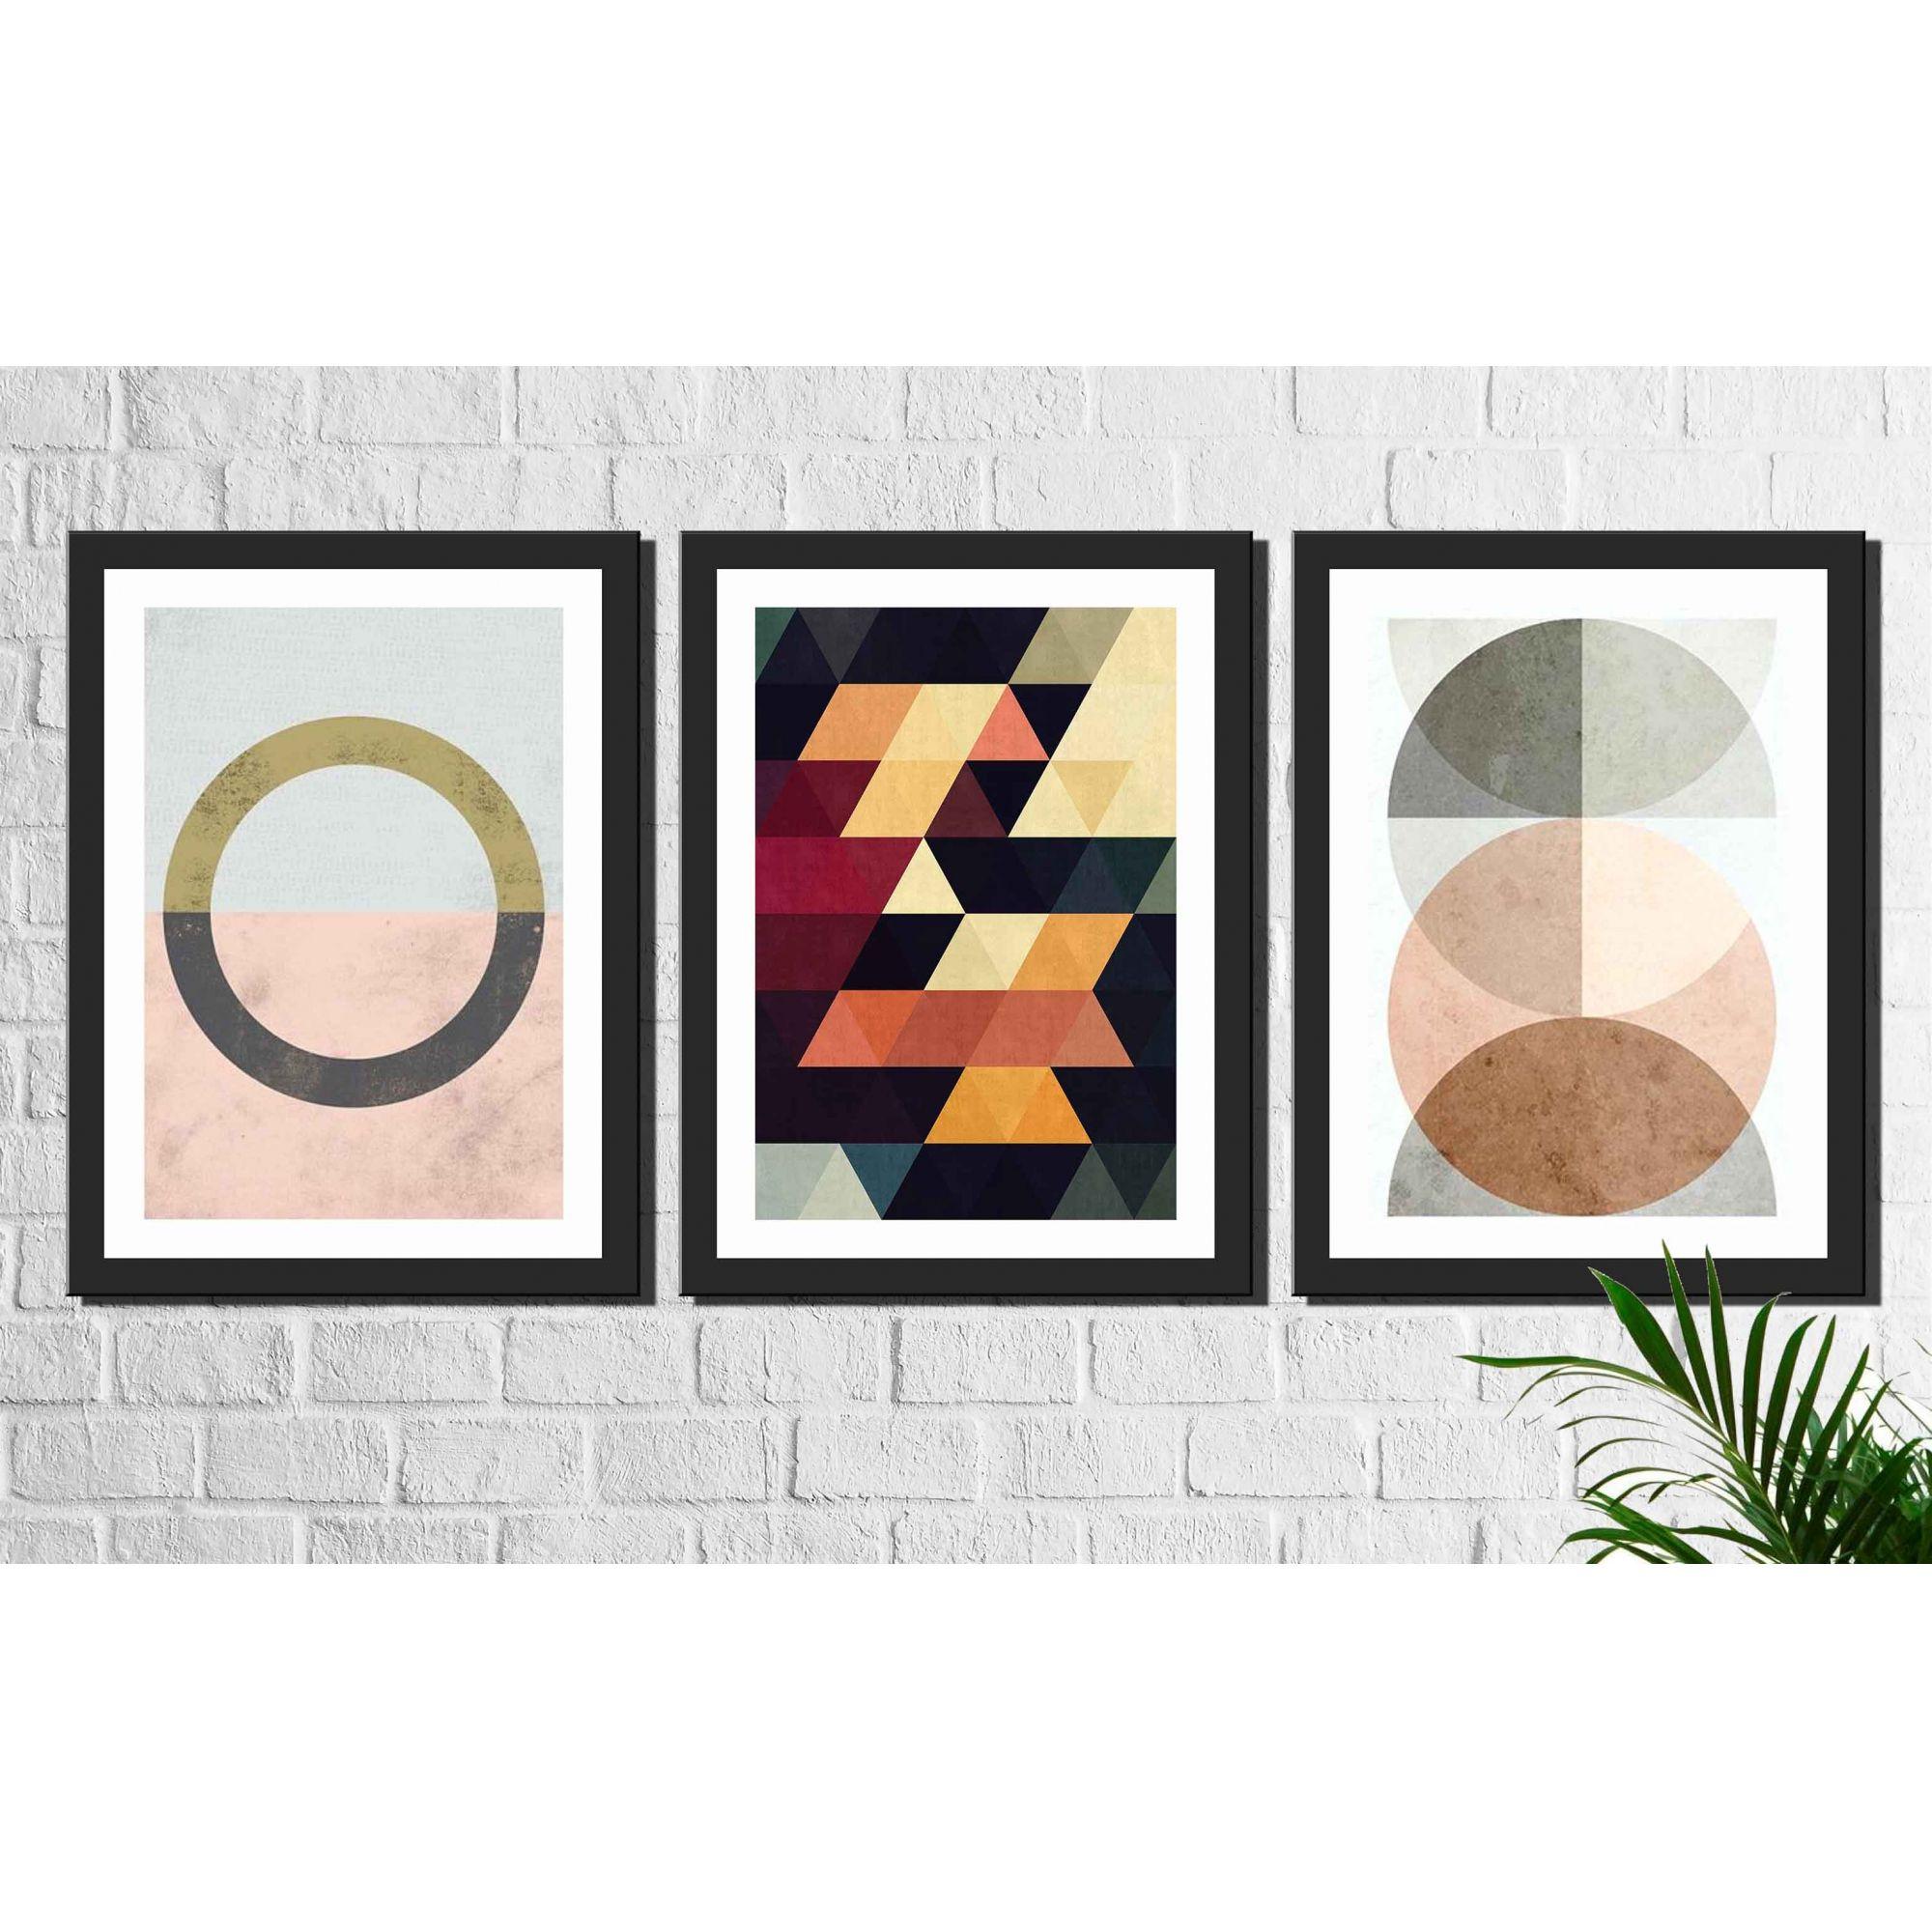 Kit 3 Quadros Decorativos Geométrico Colorido Formas